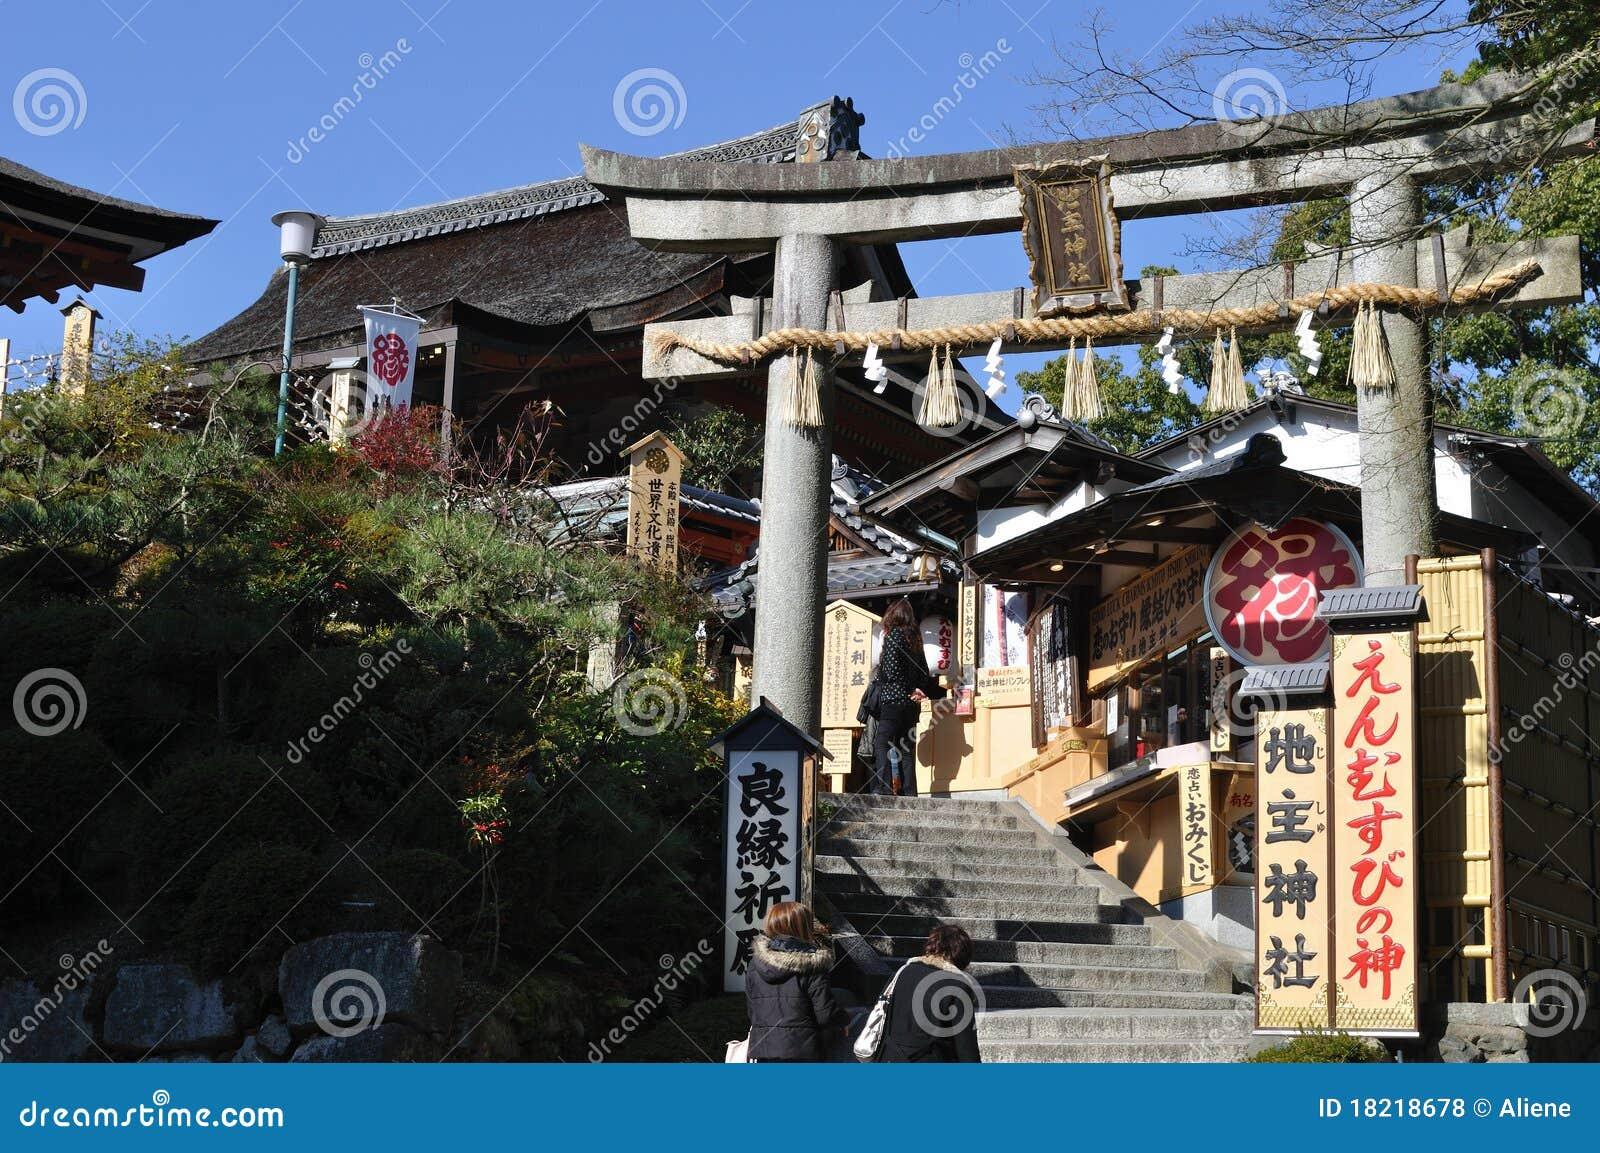 Torii Of Jishu-jinja A Matchmaking Shrine